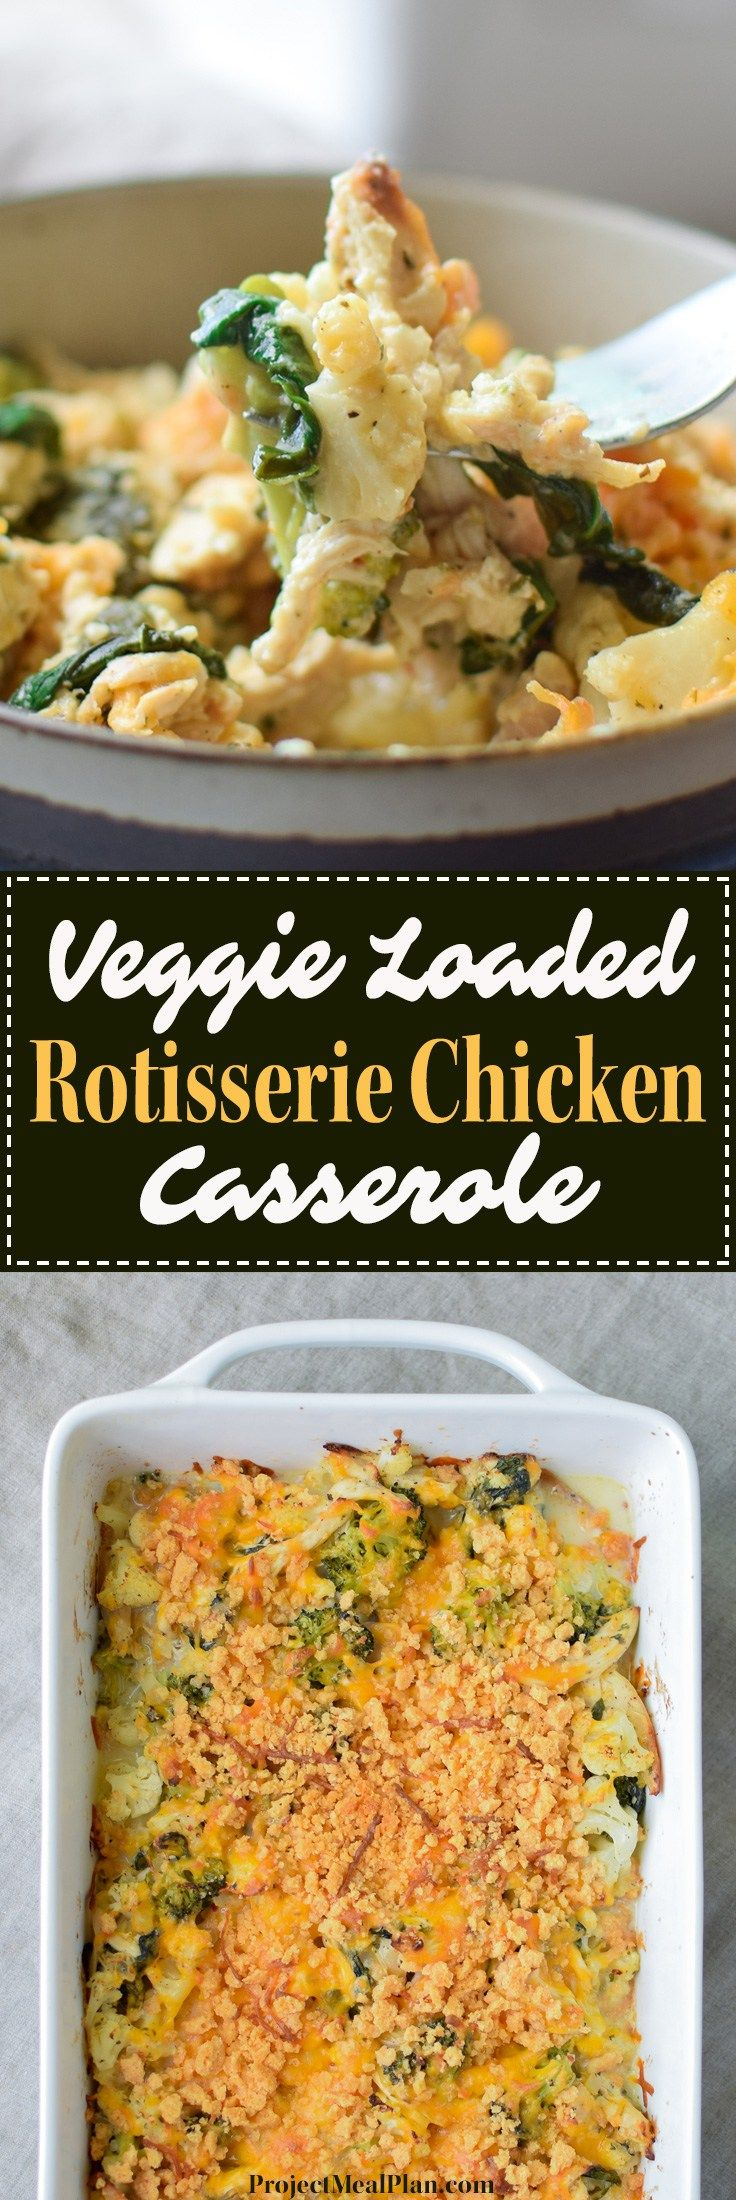 Veggie Loaded Rotisserie Chicken Casserole  Recipe  Pmp Posts And Recipes  Easy Casserole -3808